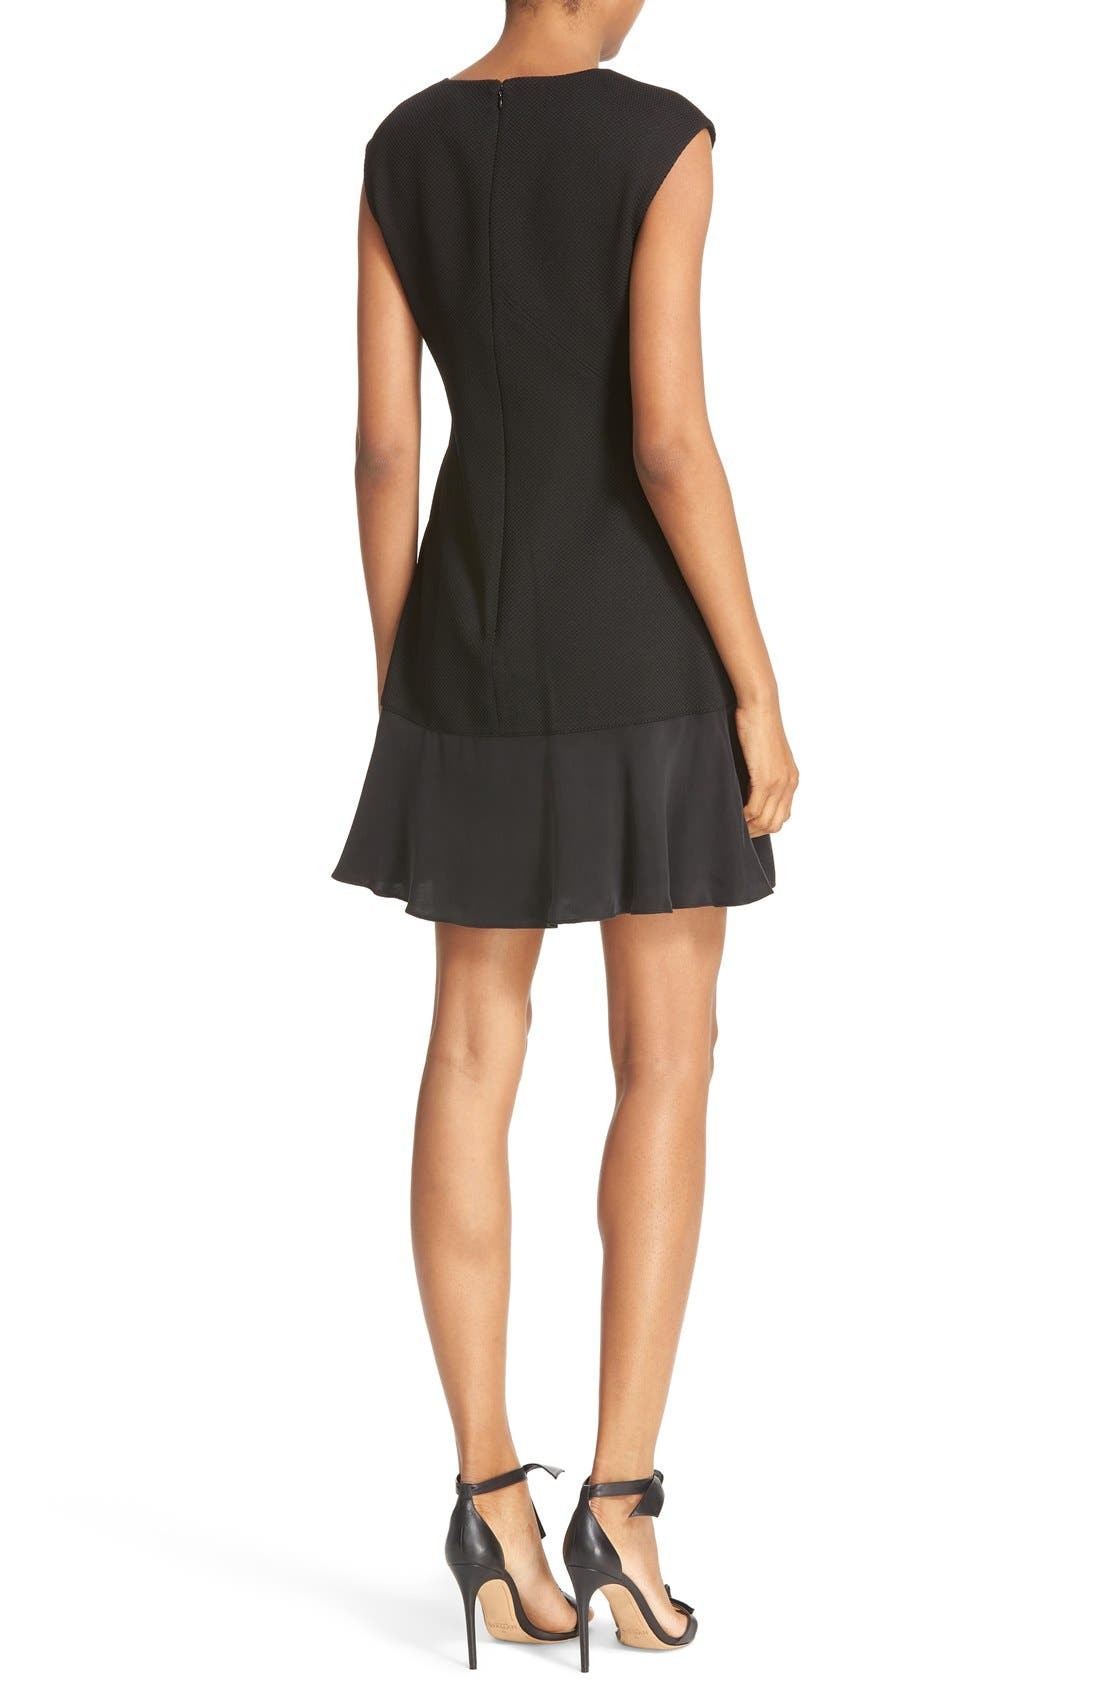 REBECCA TAYLOR, Stacy Drop Waist Dress, Alternate thumbnail 5, color, BLACK